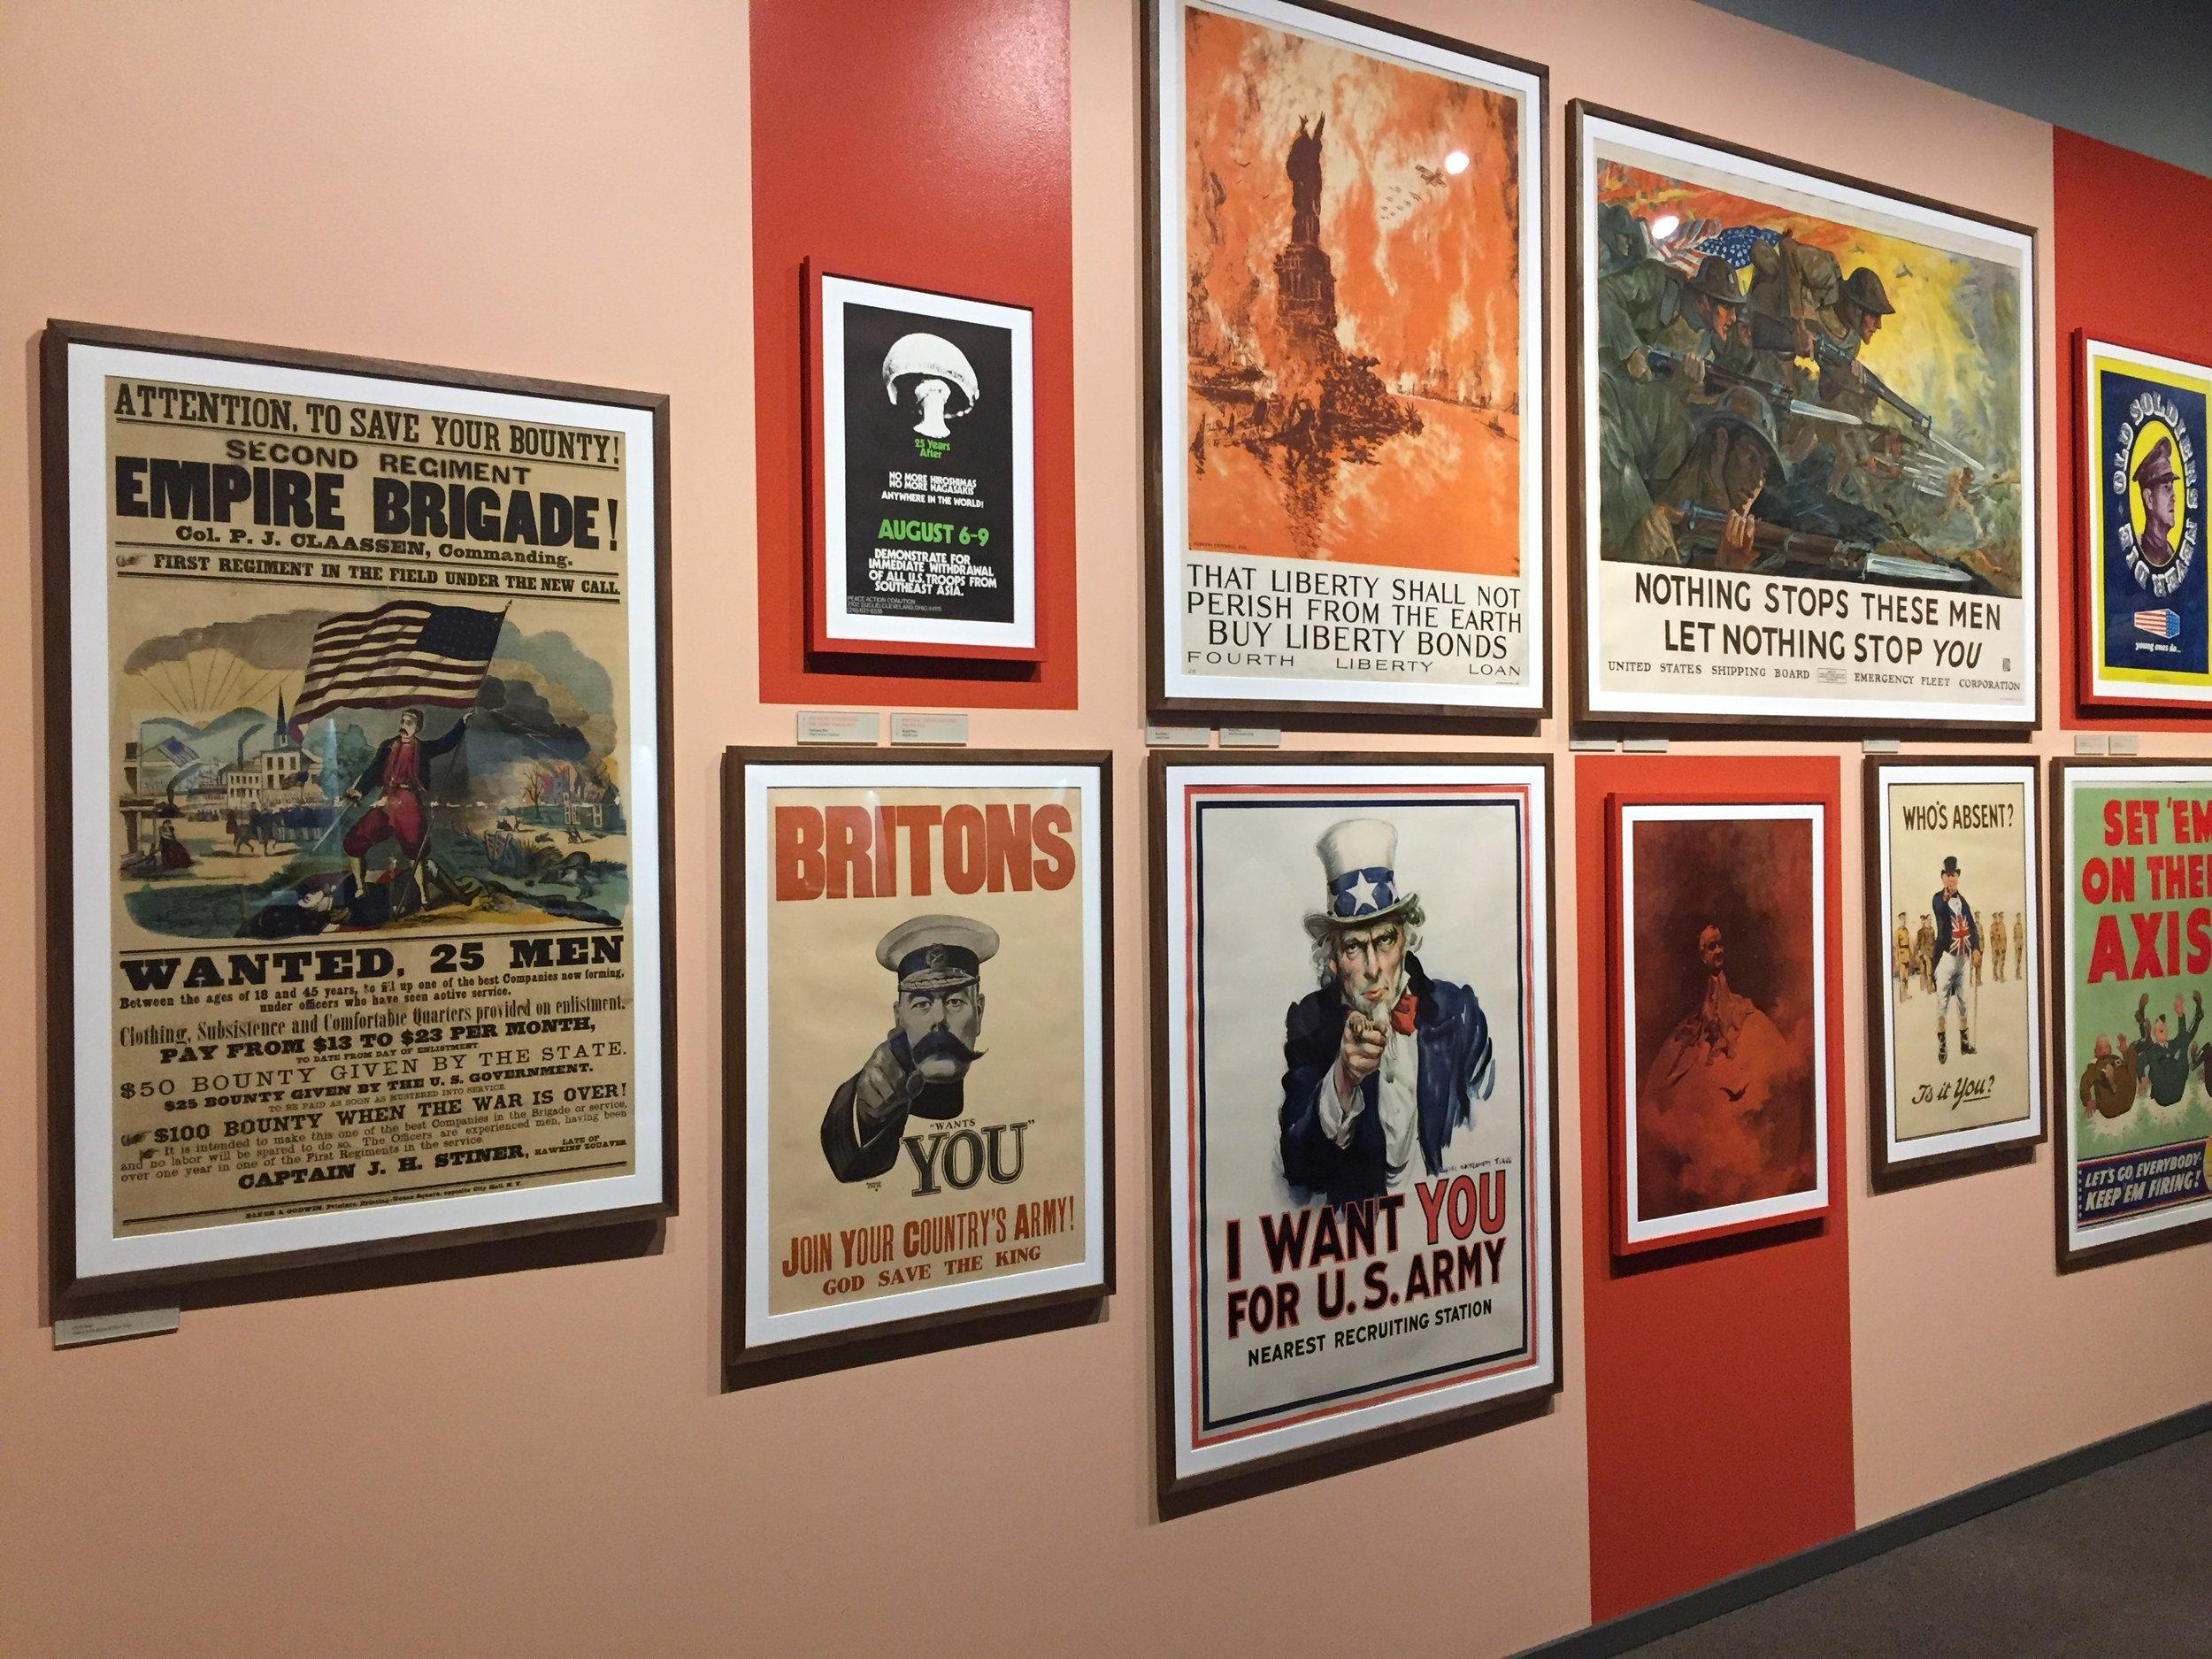 causes of war propaganda posters (1).JPG